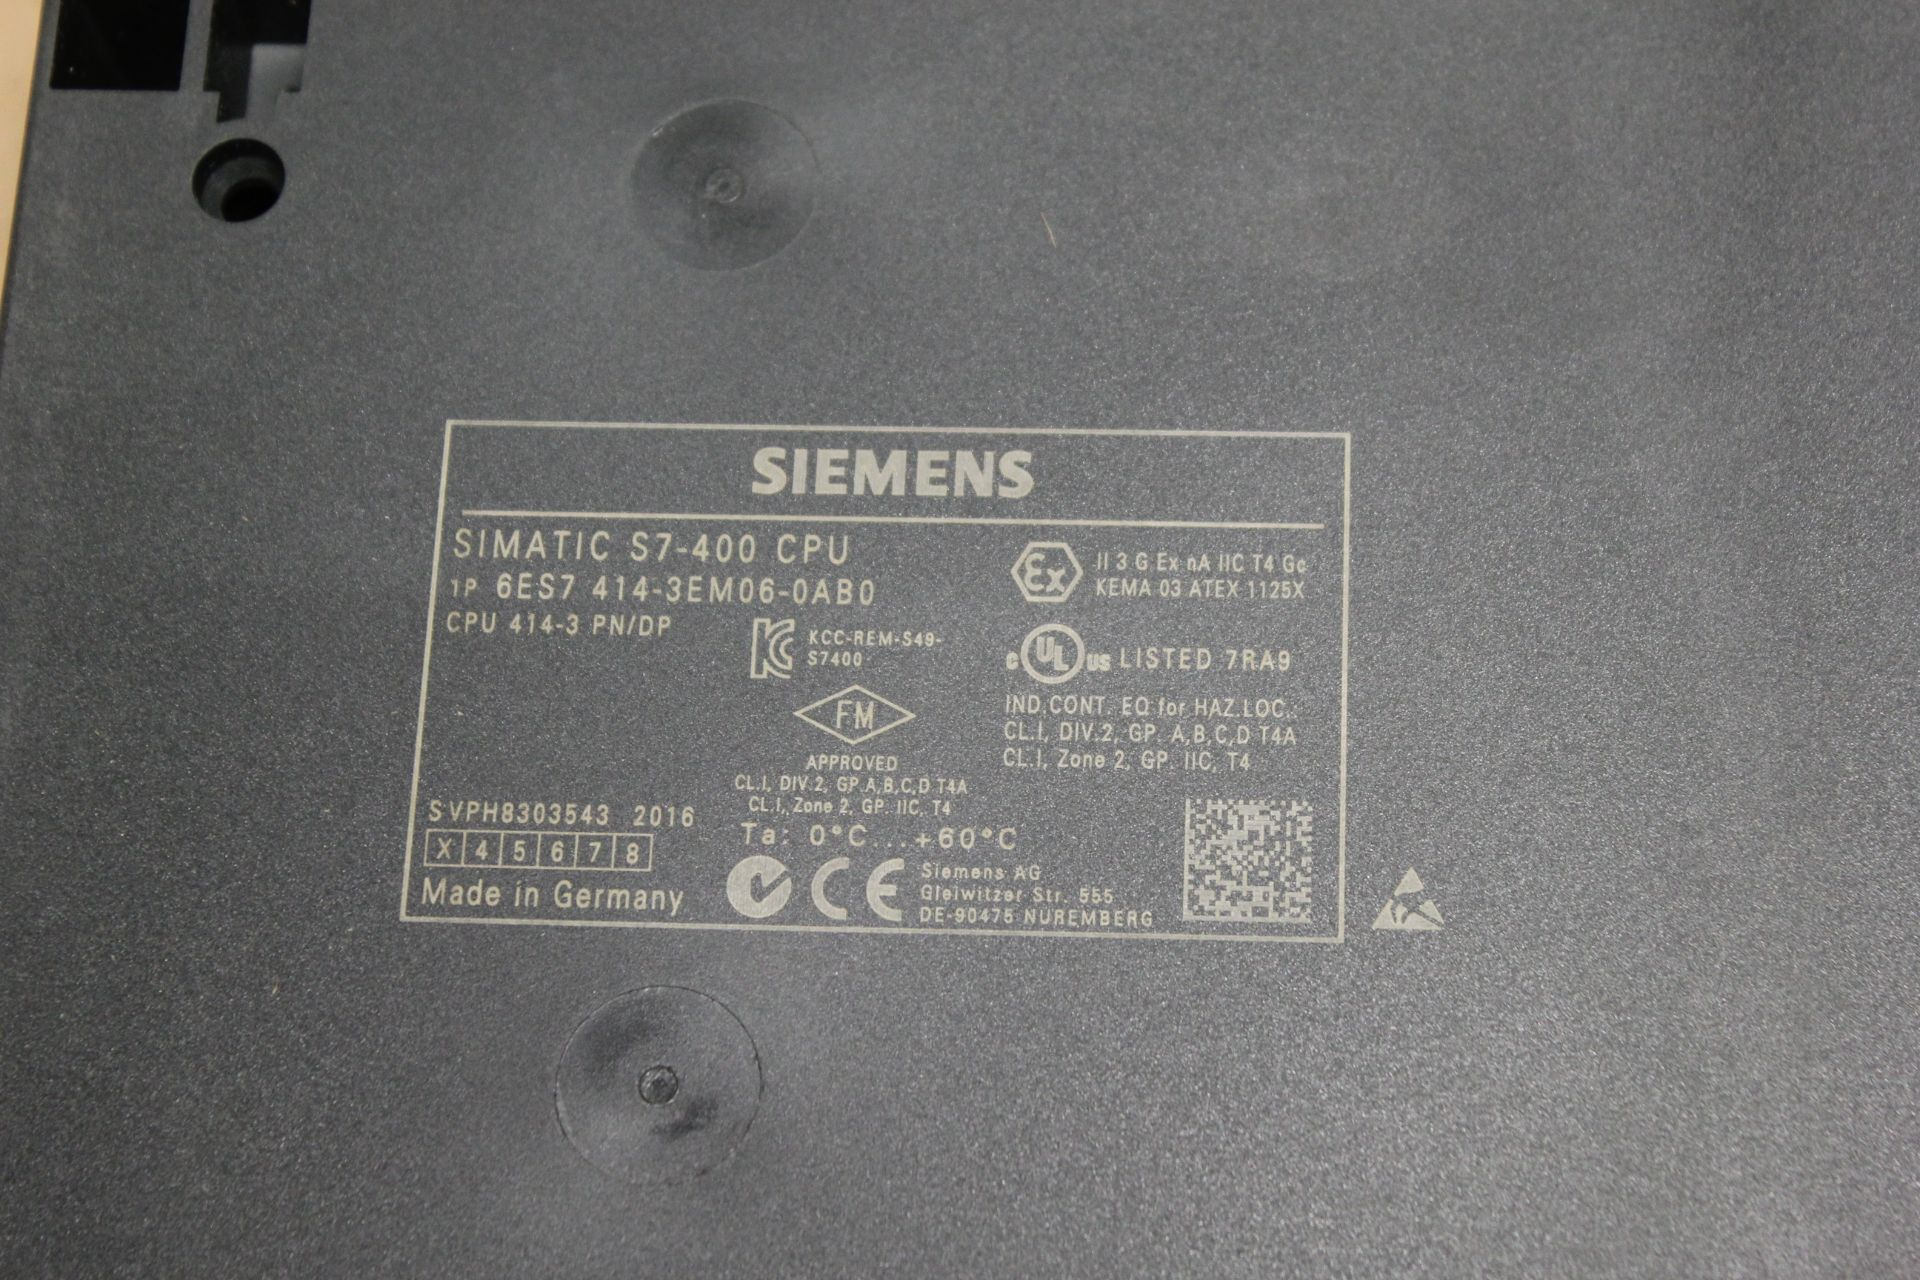 NEW SIEMENS SIMATIC S7-400 PLC CPU PROCESSOR - Image 7 of 8